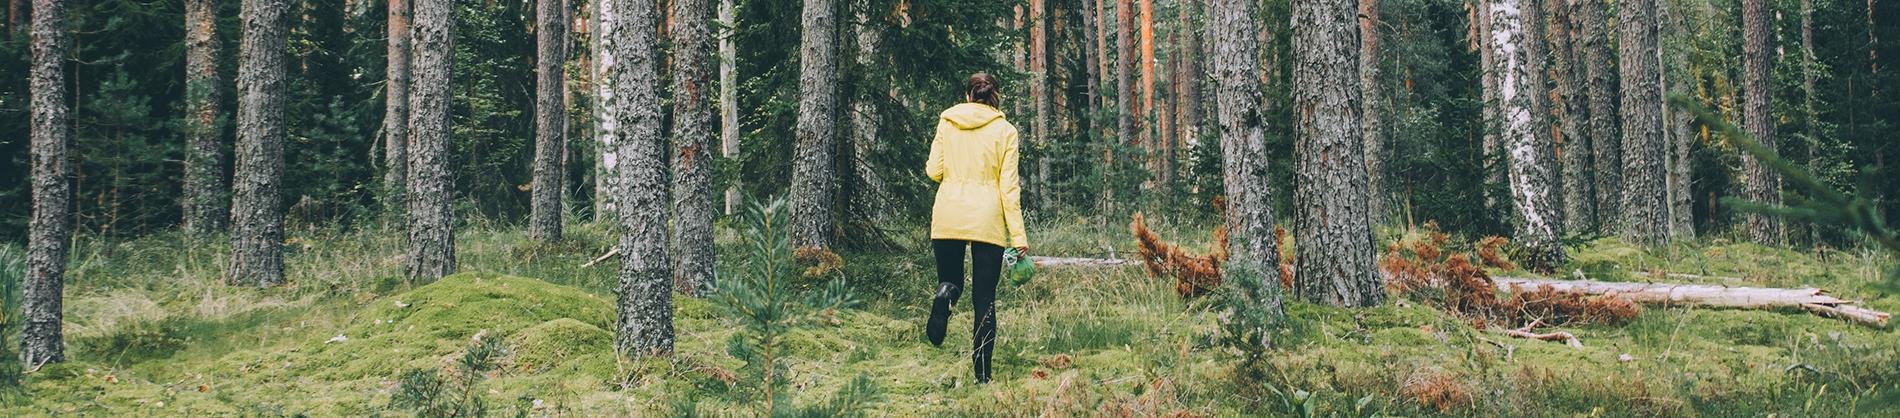 A women in a yellow coat running through a forest